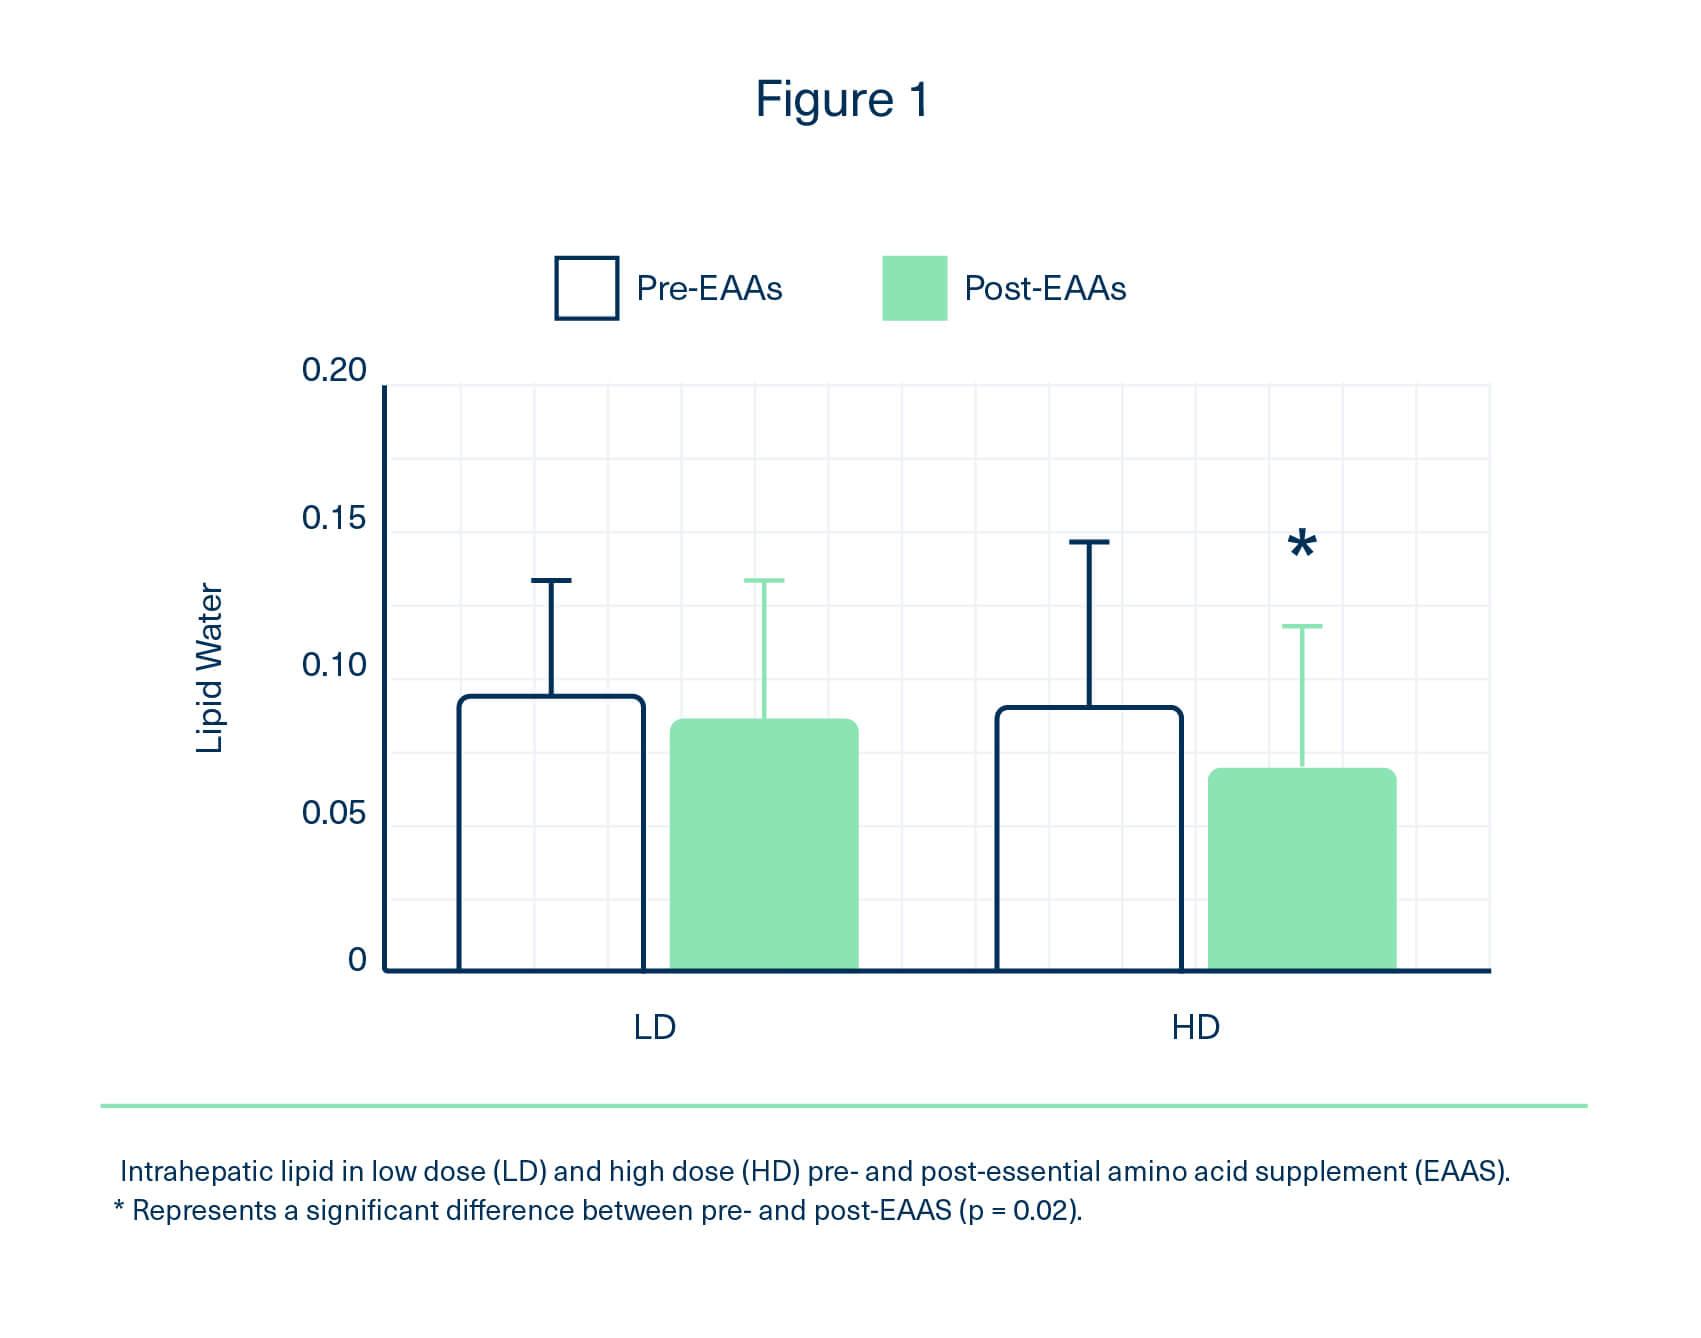 Graph showing improvement in intrahepatic lipid in patients using essential amino acid supplements